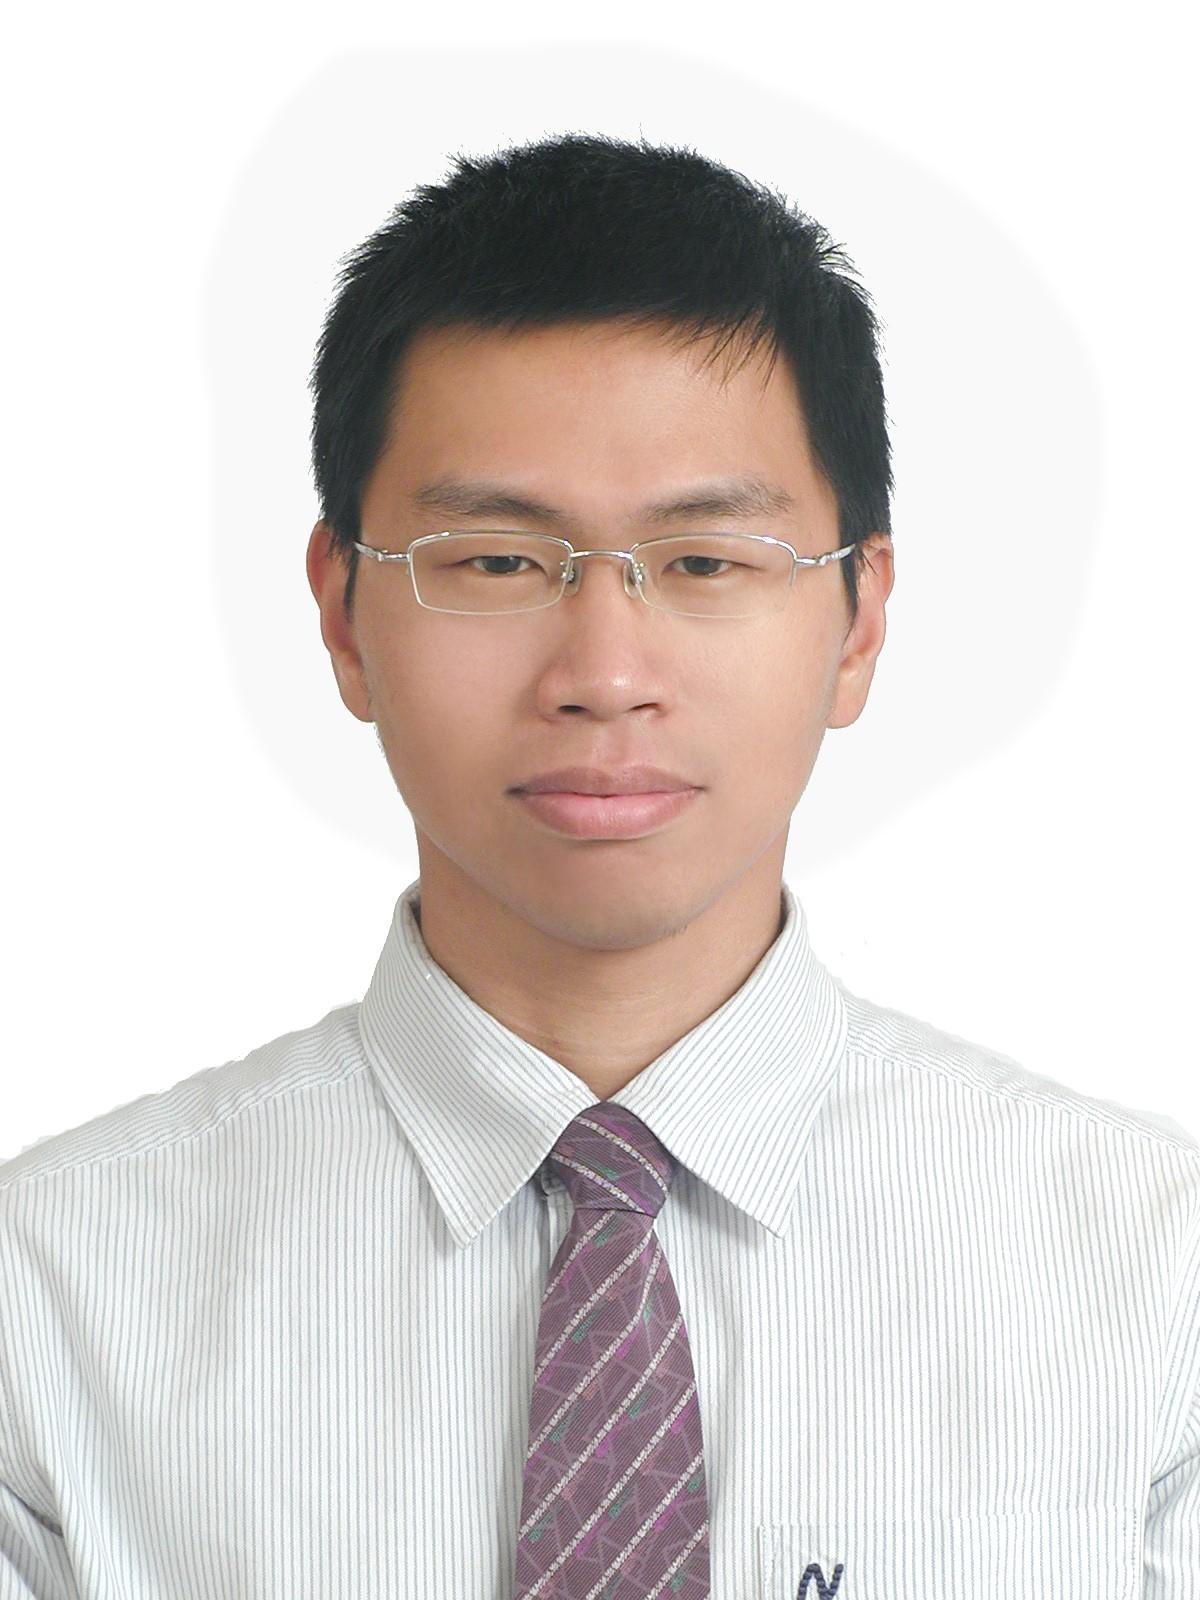 蘇柏榮 Po-Jung Su